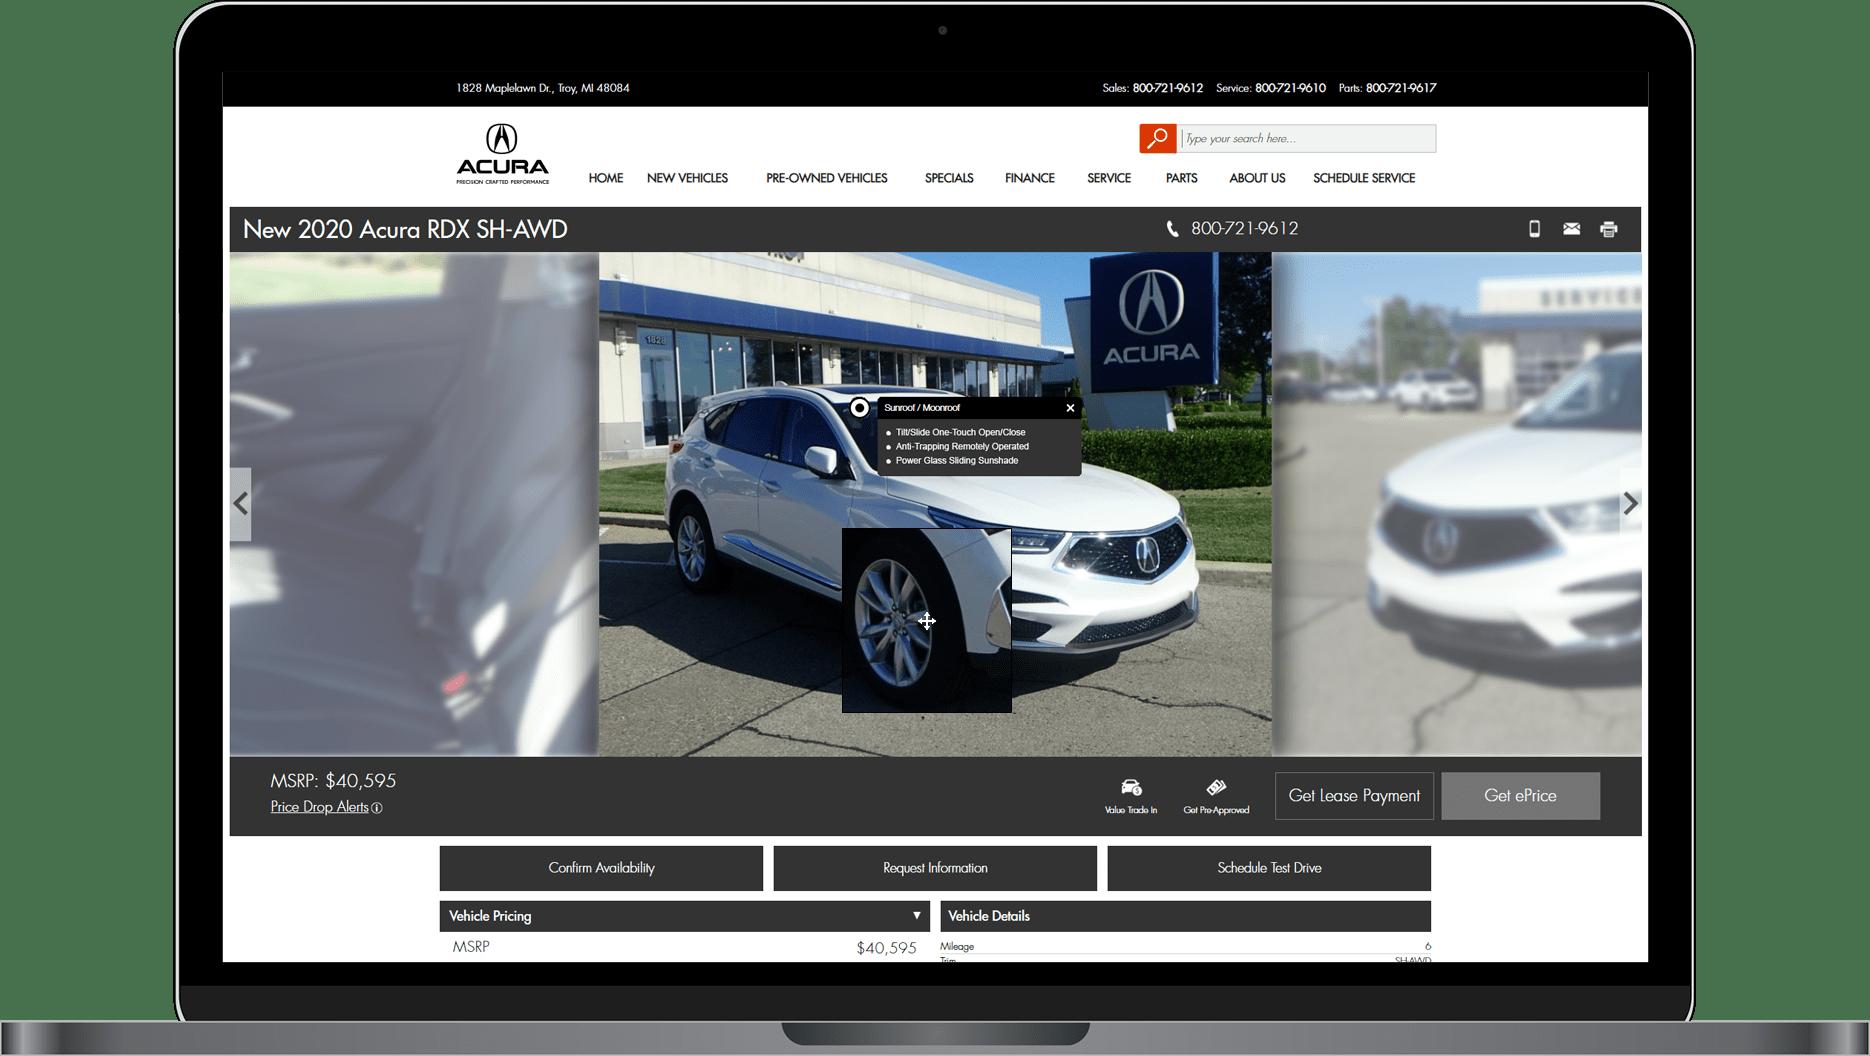 VDPxL image of an Acura RDX